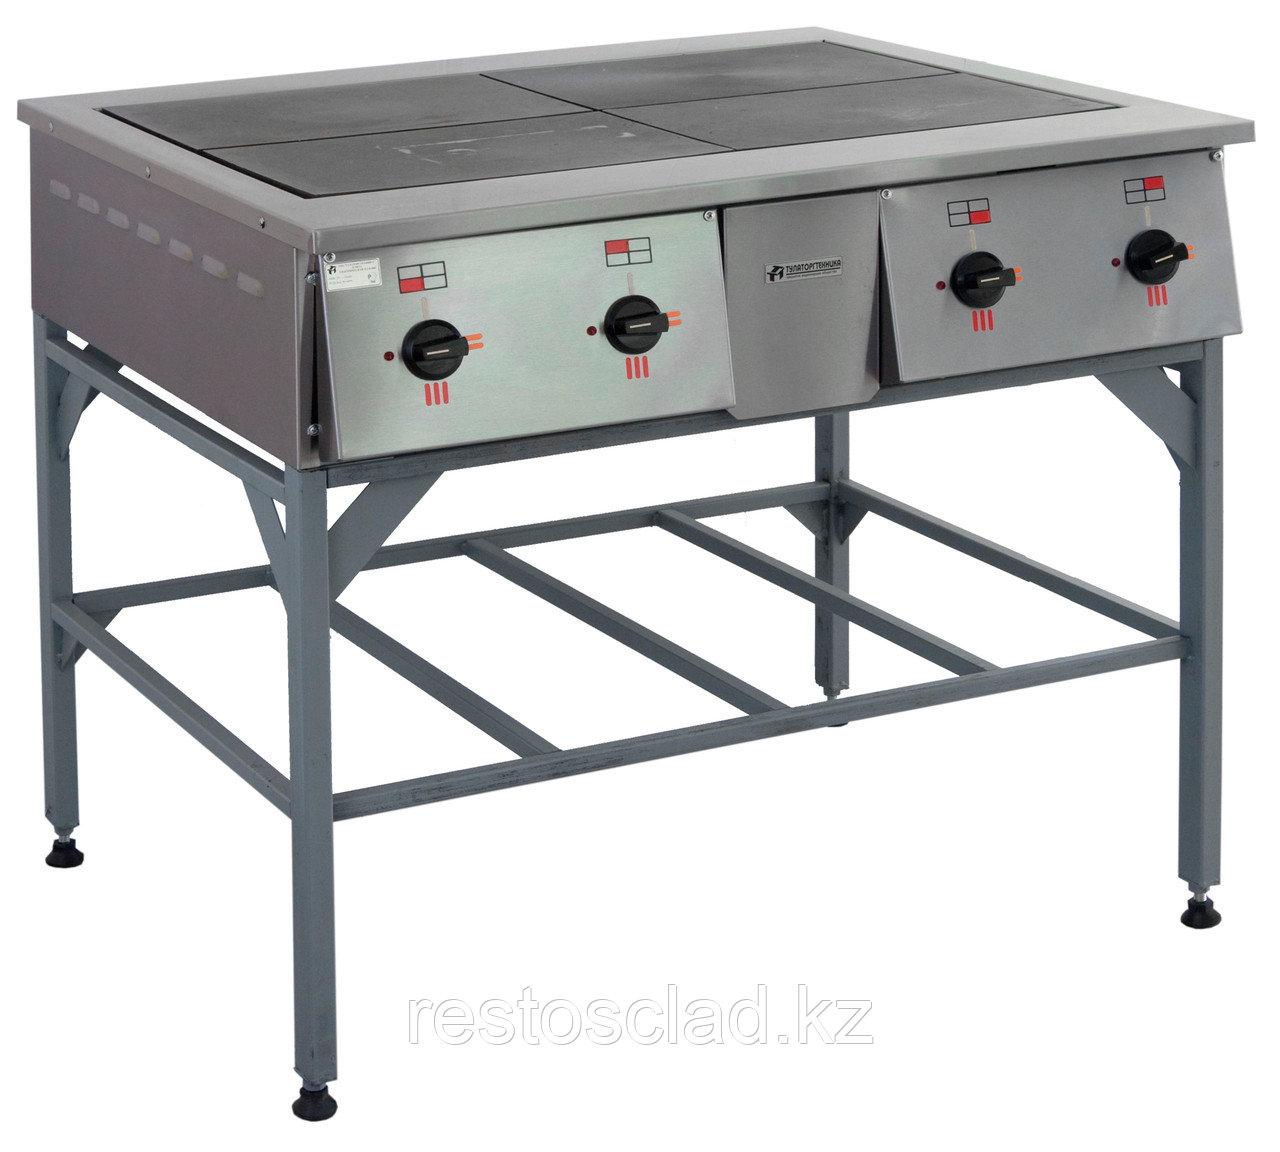 Плита электрическая ТУЛАТОРГТЕХНИКА ПЭ-0.48Н четырехконфорочная без жарочного шкафа